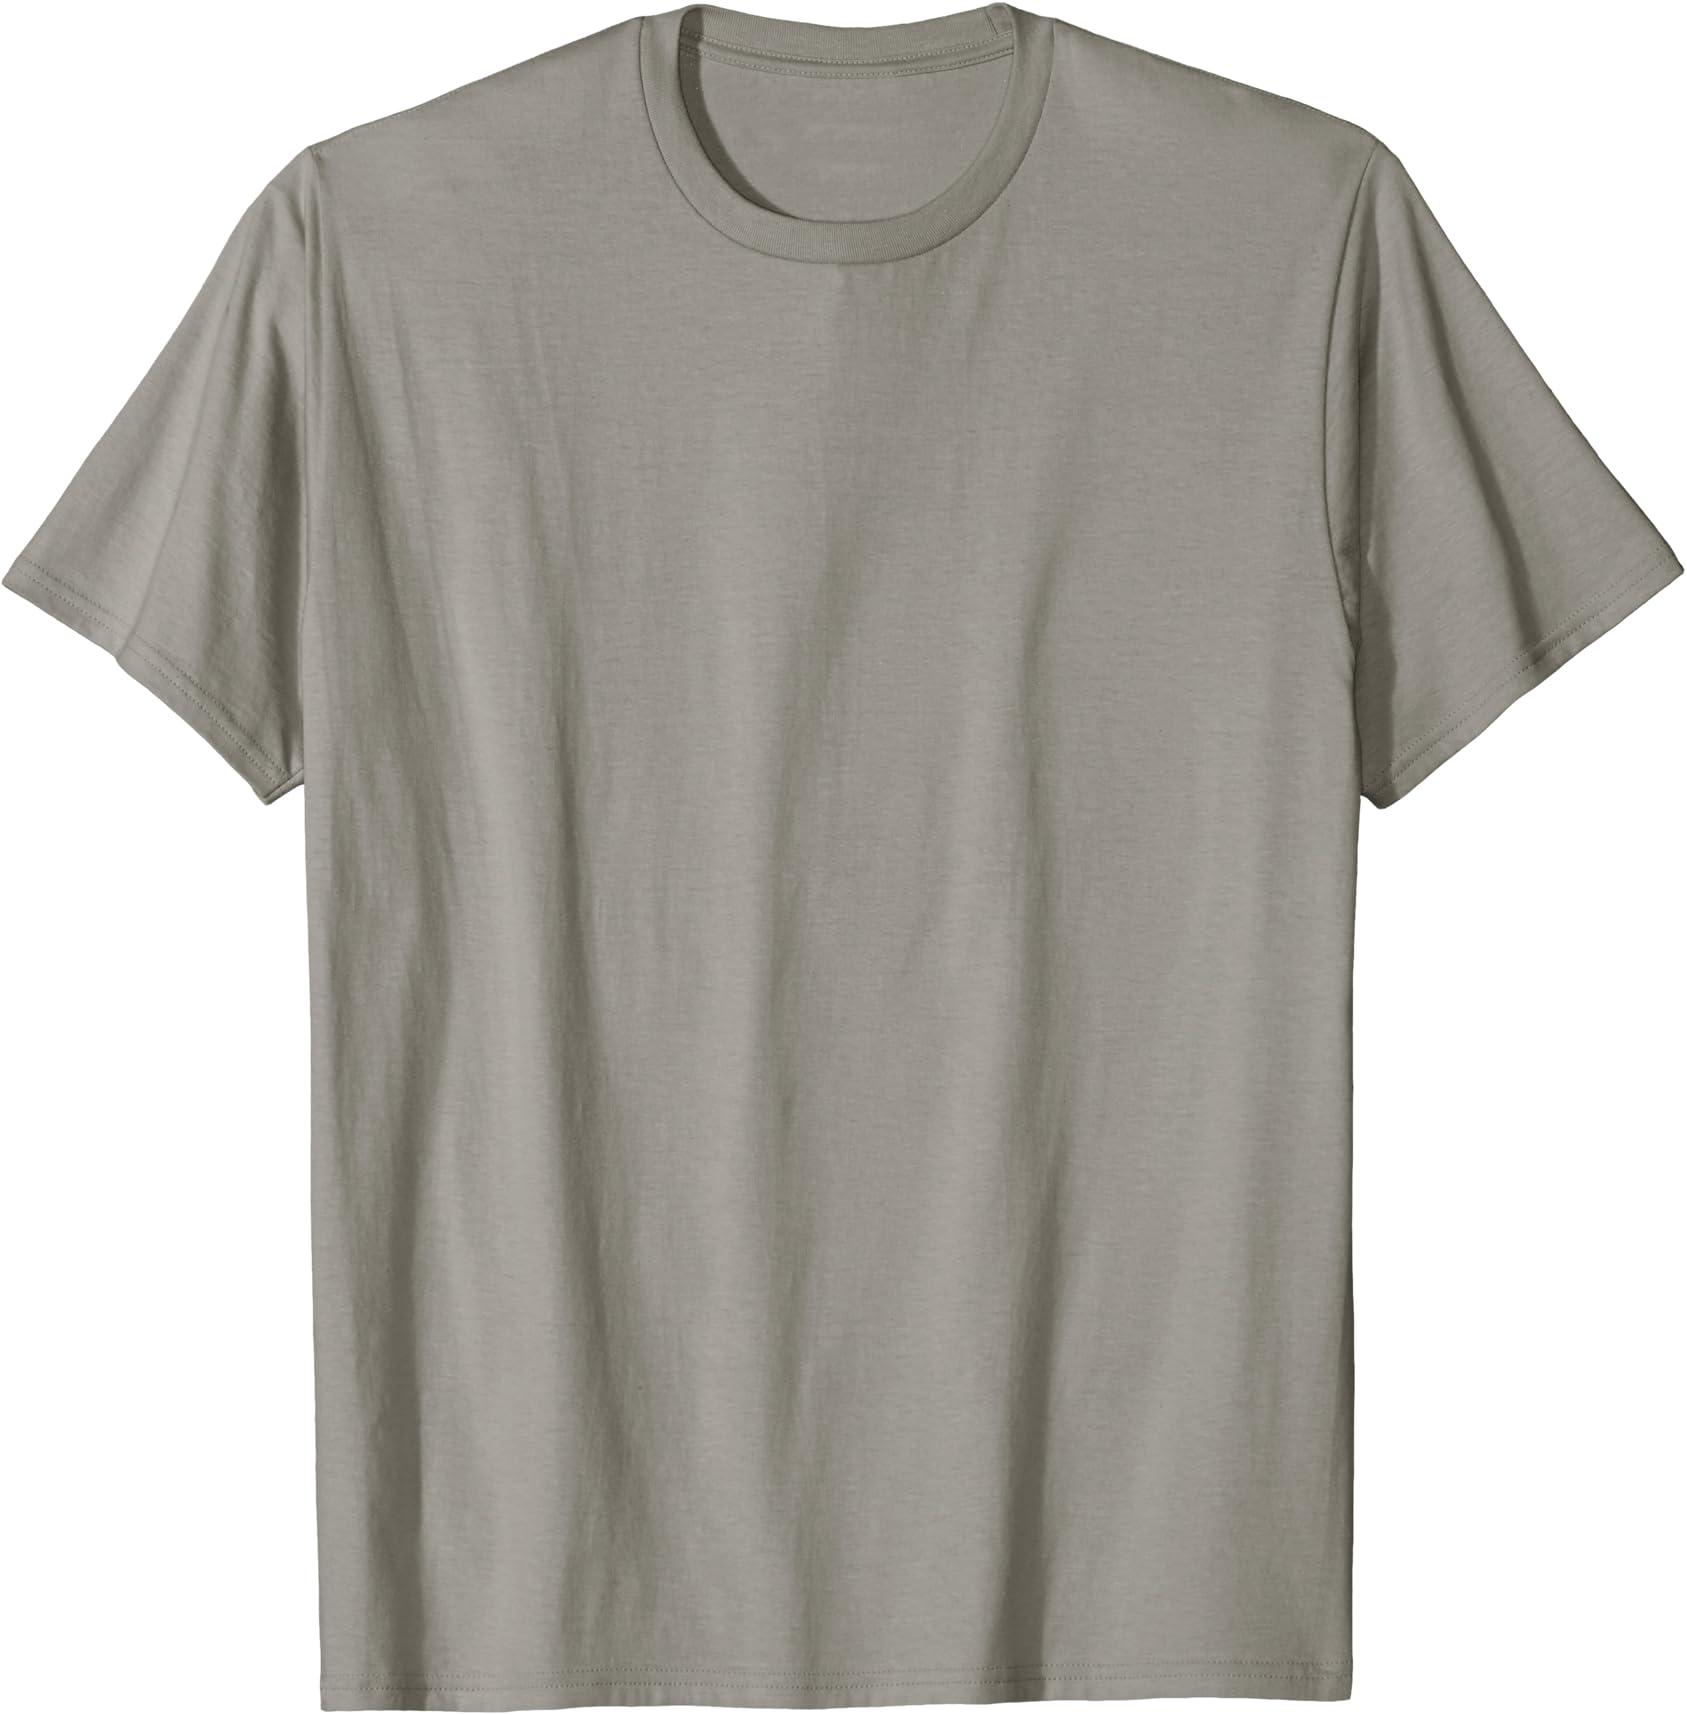 Adult Sizes Womens T-shirt Hebrew Israel  Women Shirt SIZES S-XL